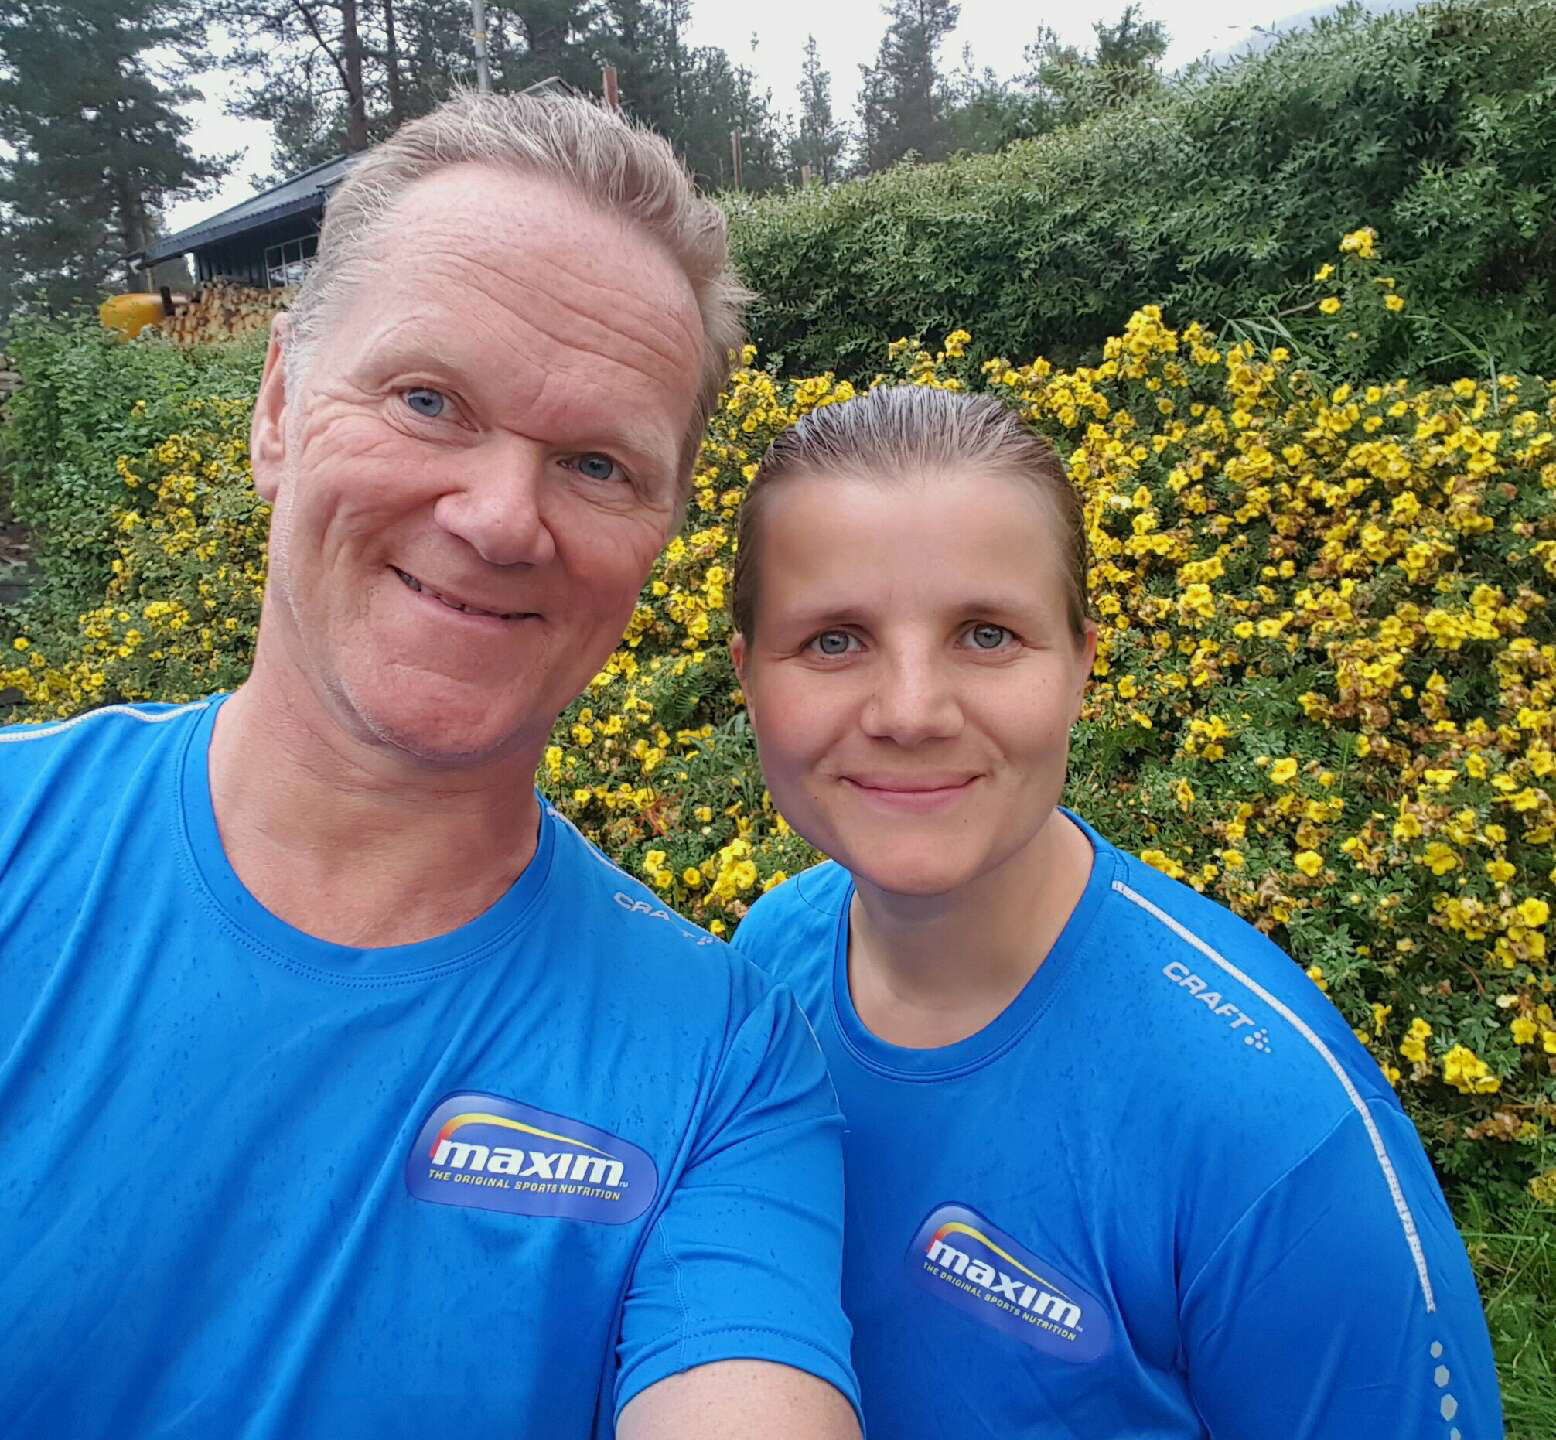 SPREKT PAR: I høst løp Nils-Einar og Trine Oslo Maraton for Team Maxim.